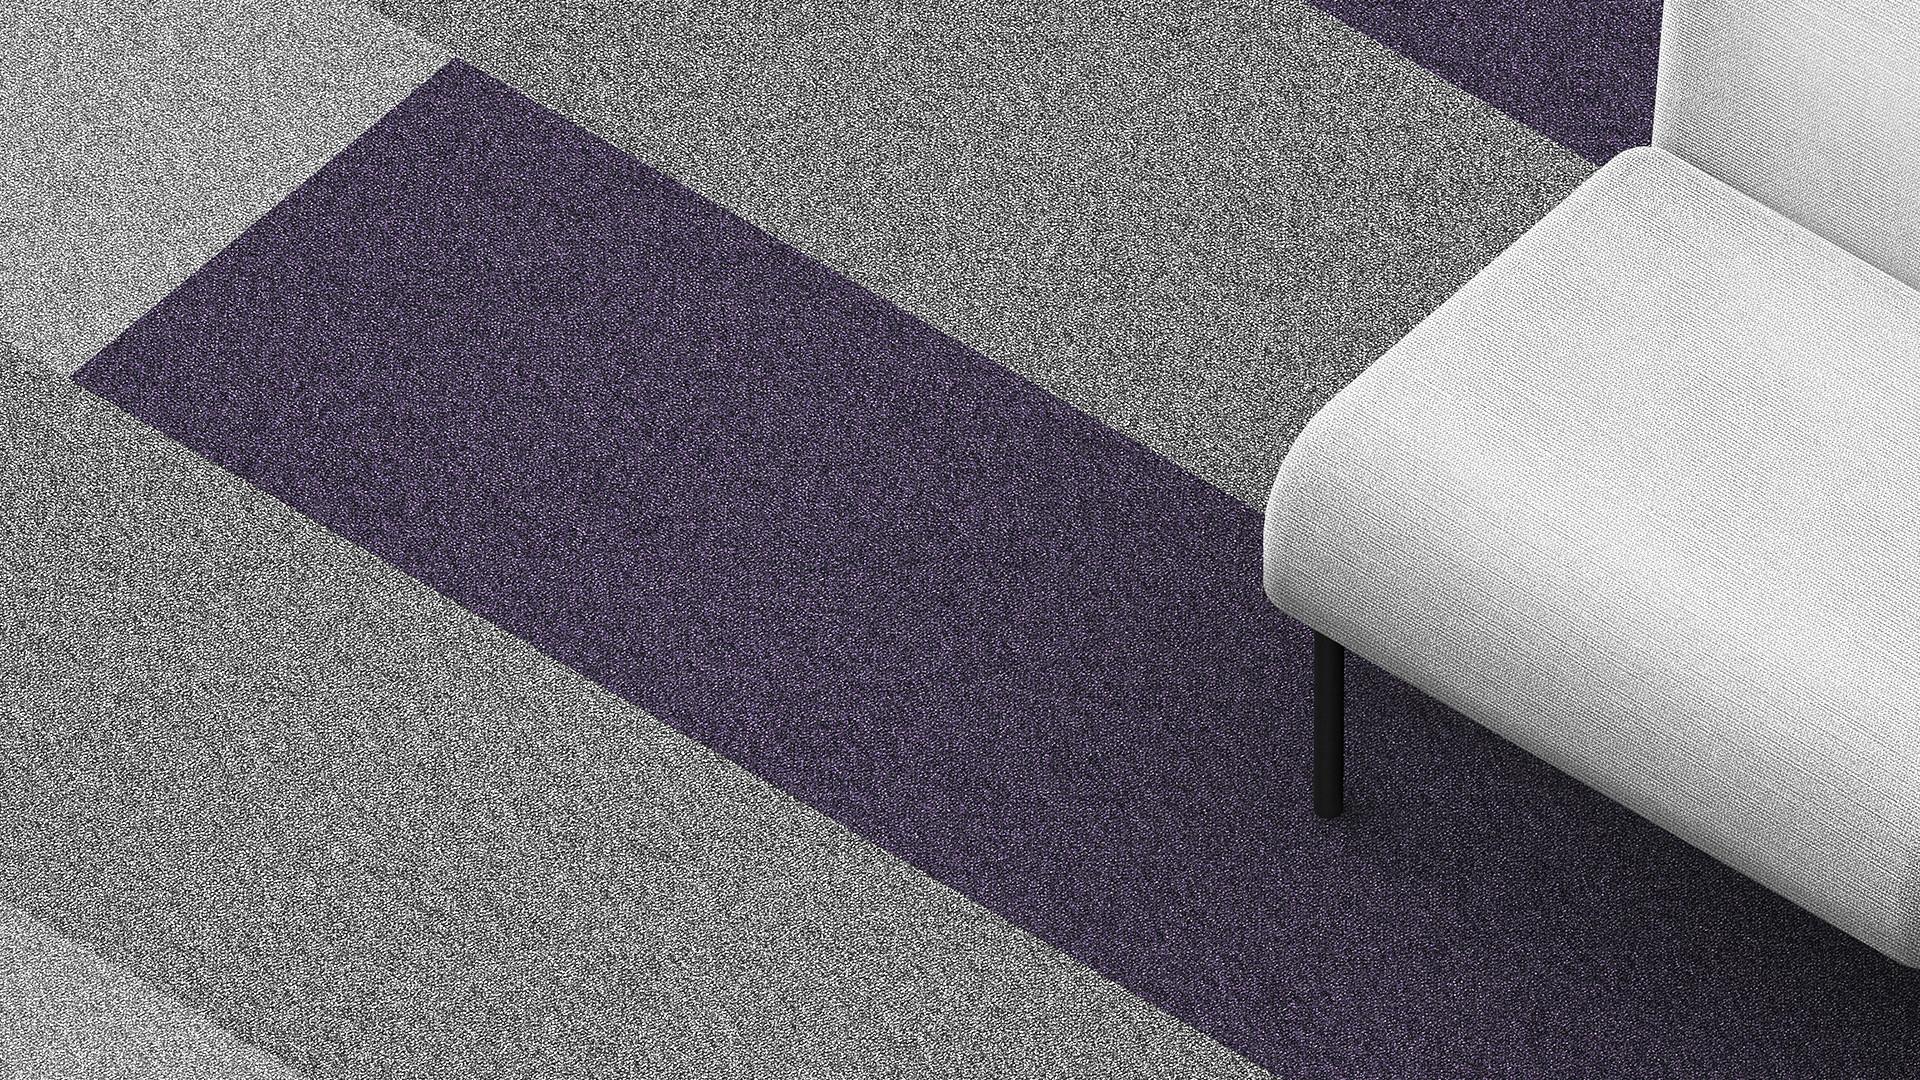 kavrolex_tile_carpet_00008_1.jpg